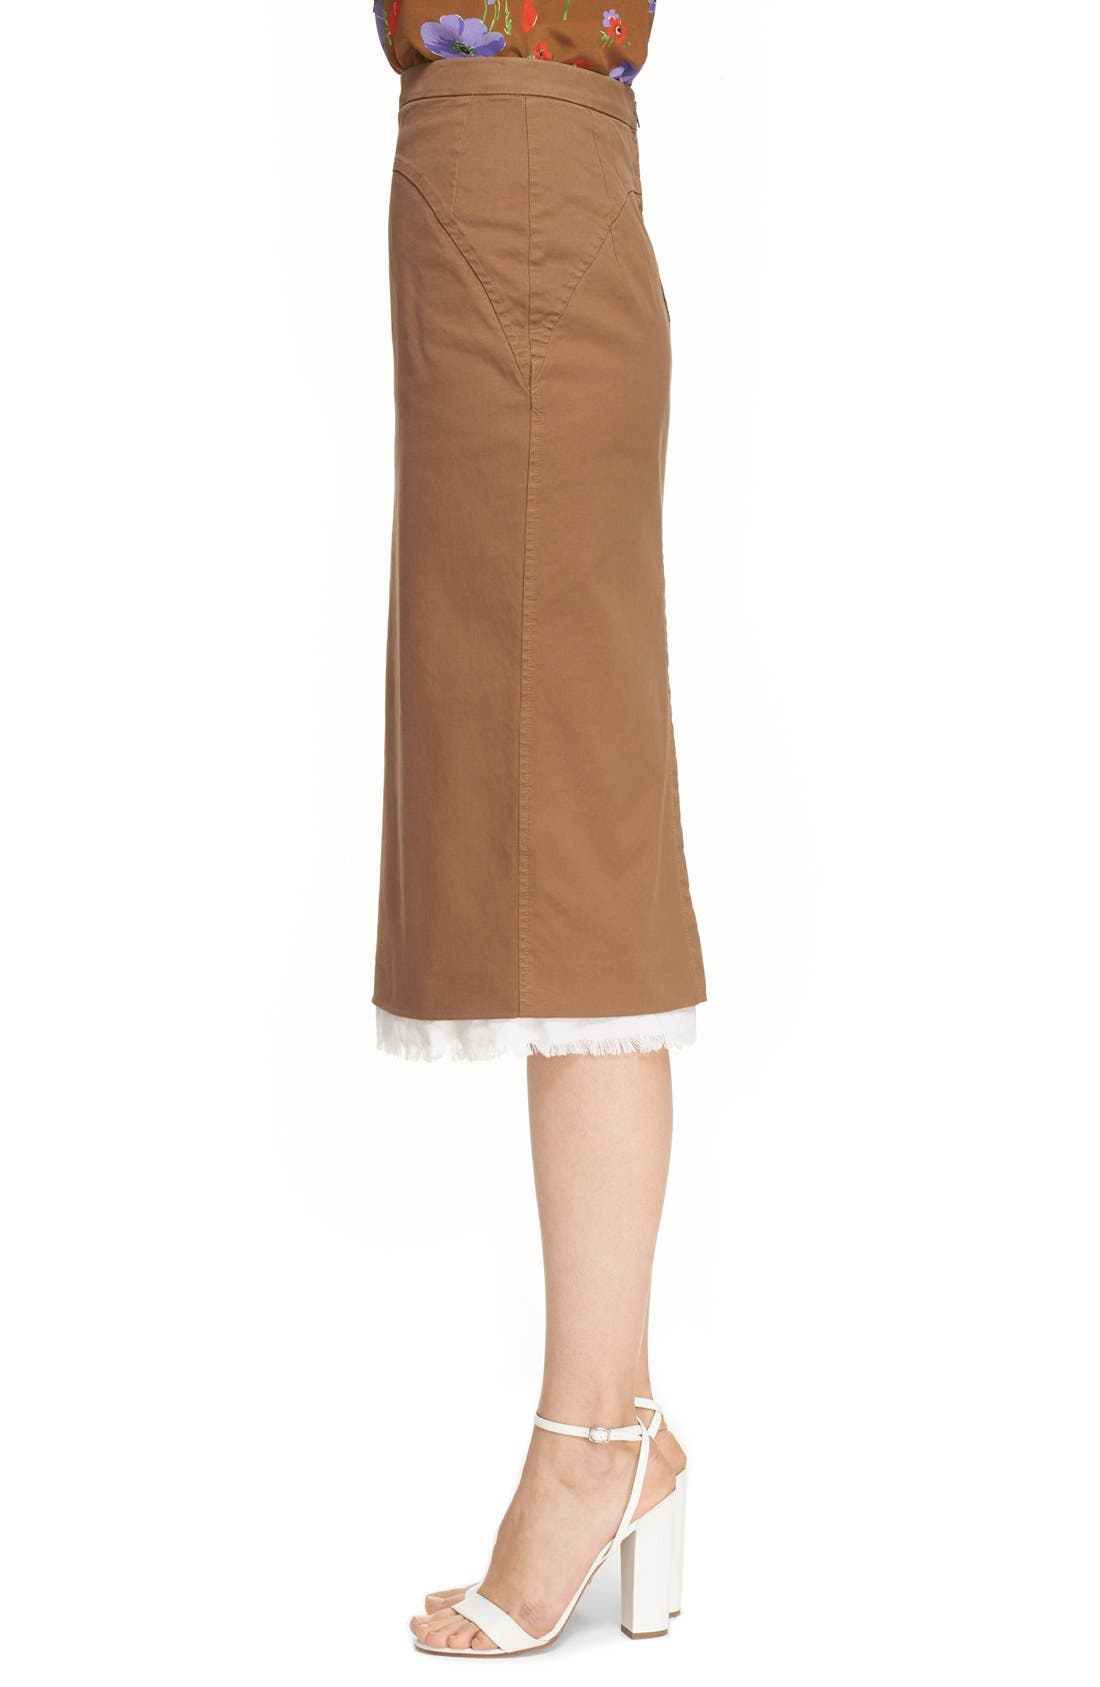 Alternate Image 3  - Nº21 'Lison' Frayed Hem Khaki Pencil Skirt